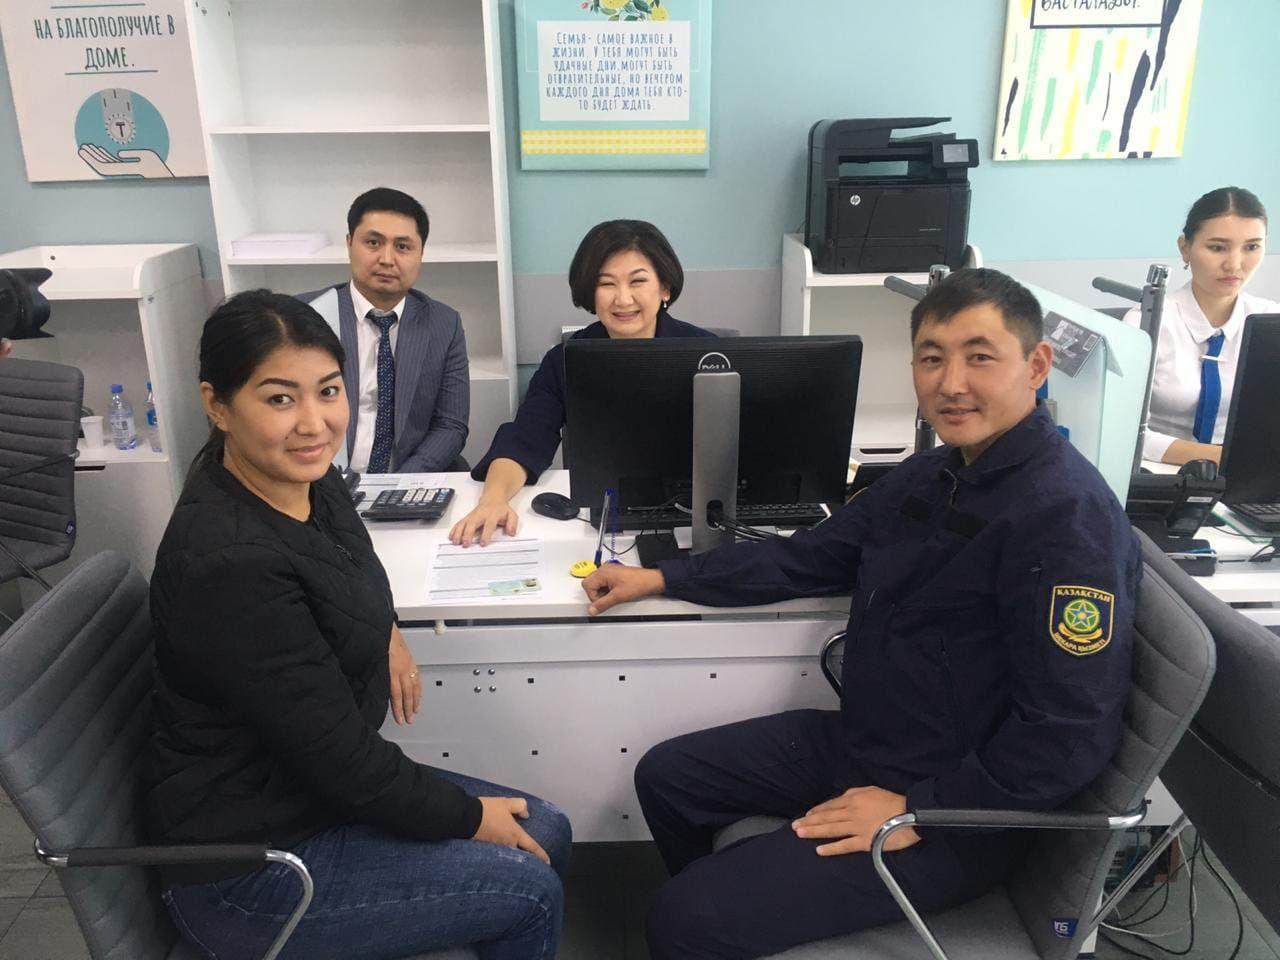 Японский подход казахстанского менеджмента- Kapital.kz